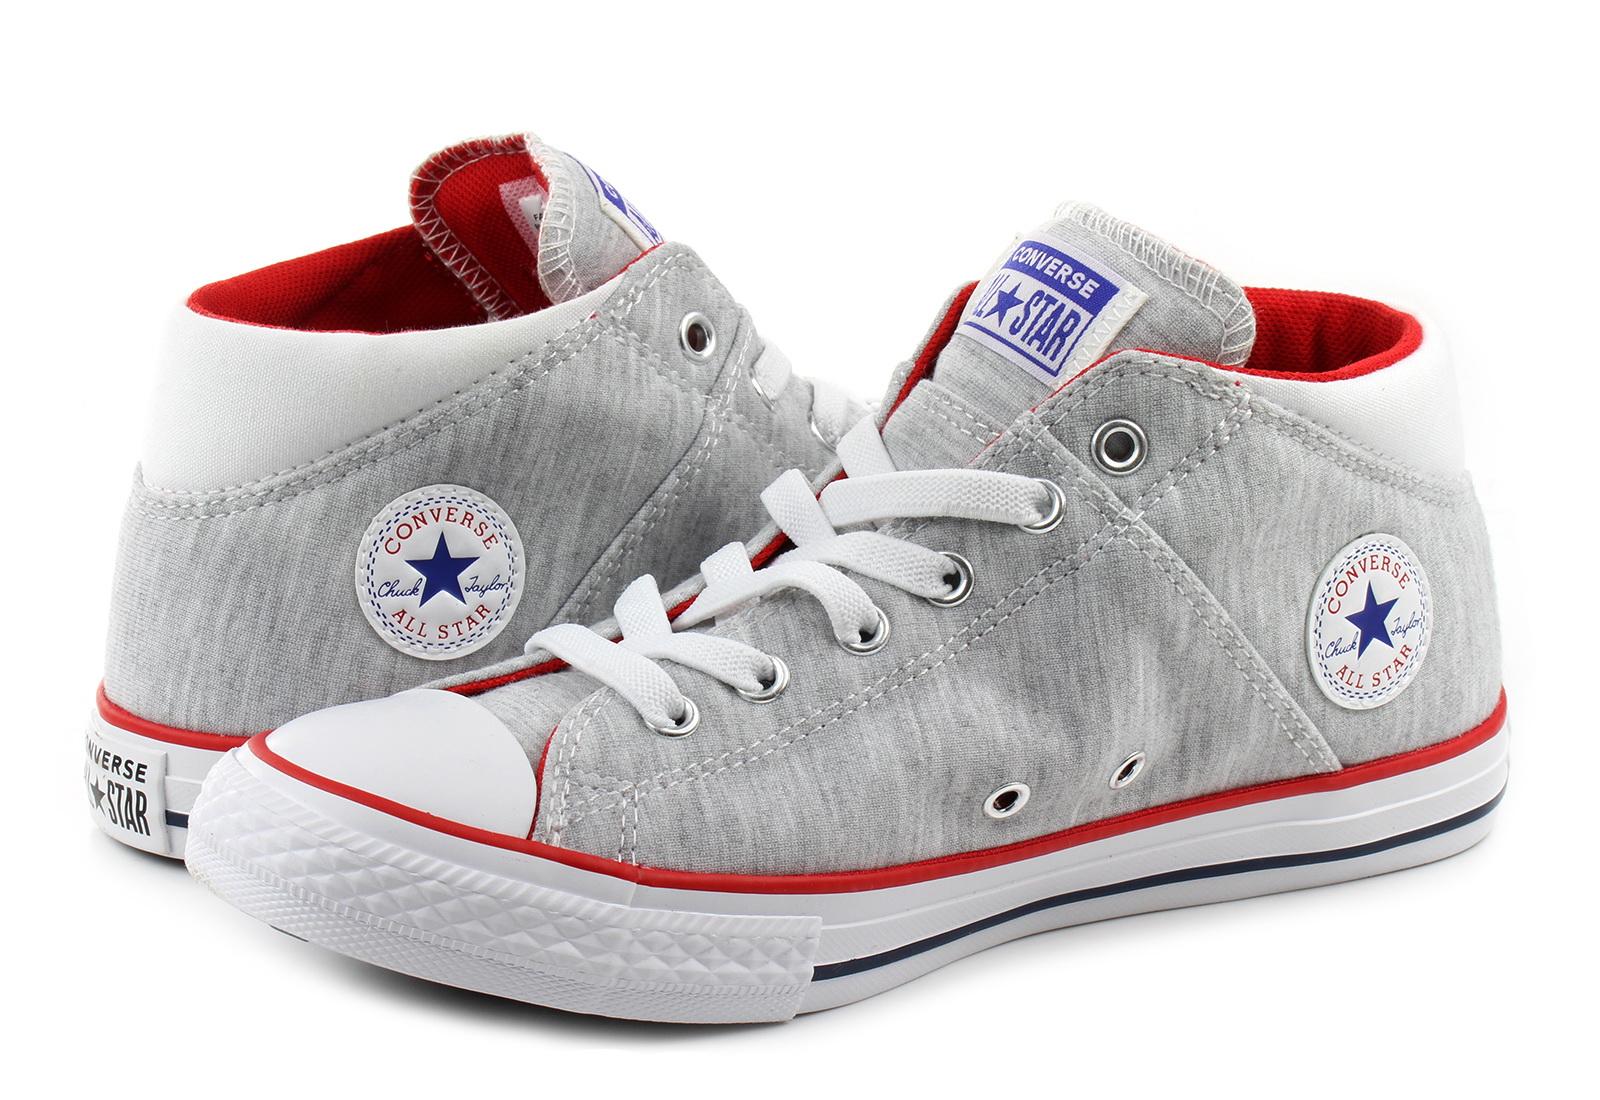 Trampki Converse Madison Mid za 107zł (trzy kolory, rozm.35-38) @ Office Shoes